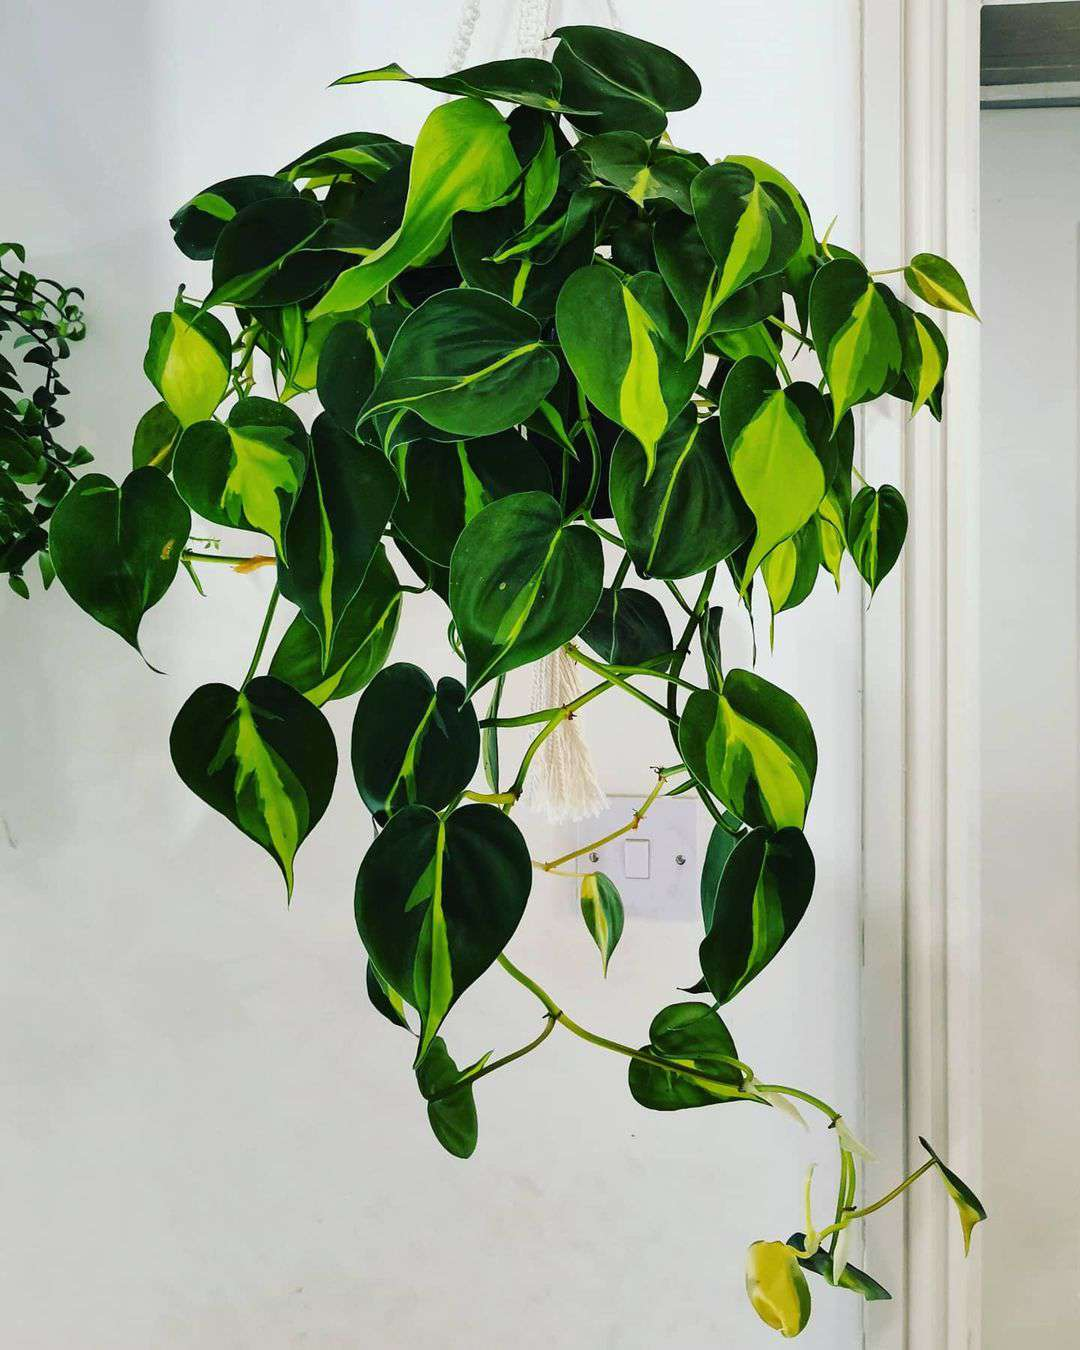 philodendron brasil plant in hanging basket